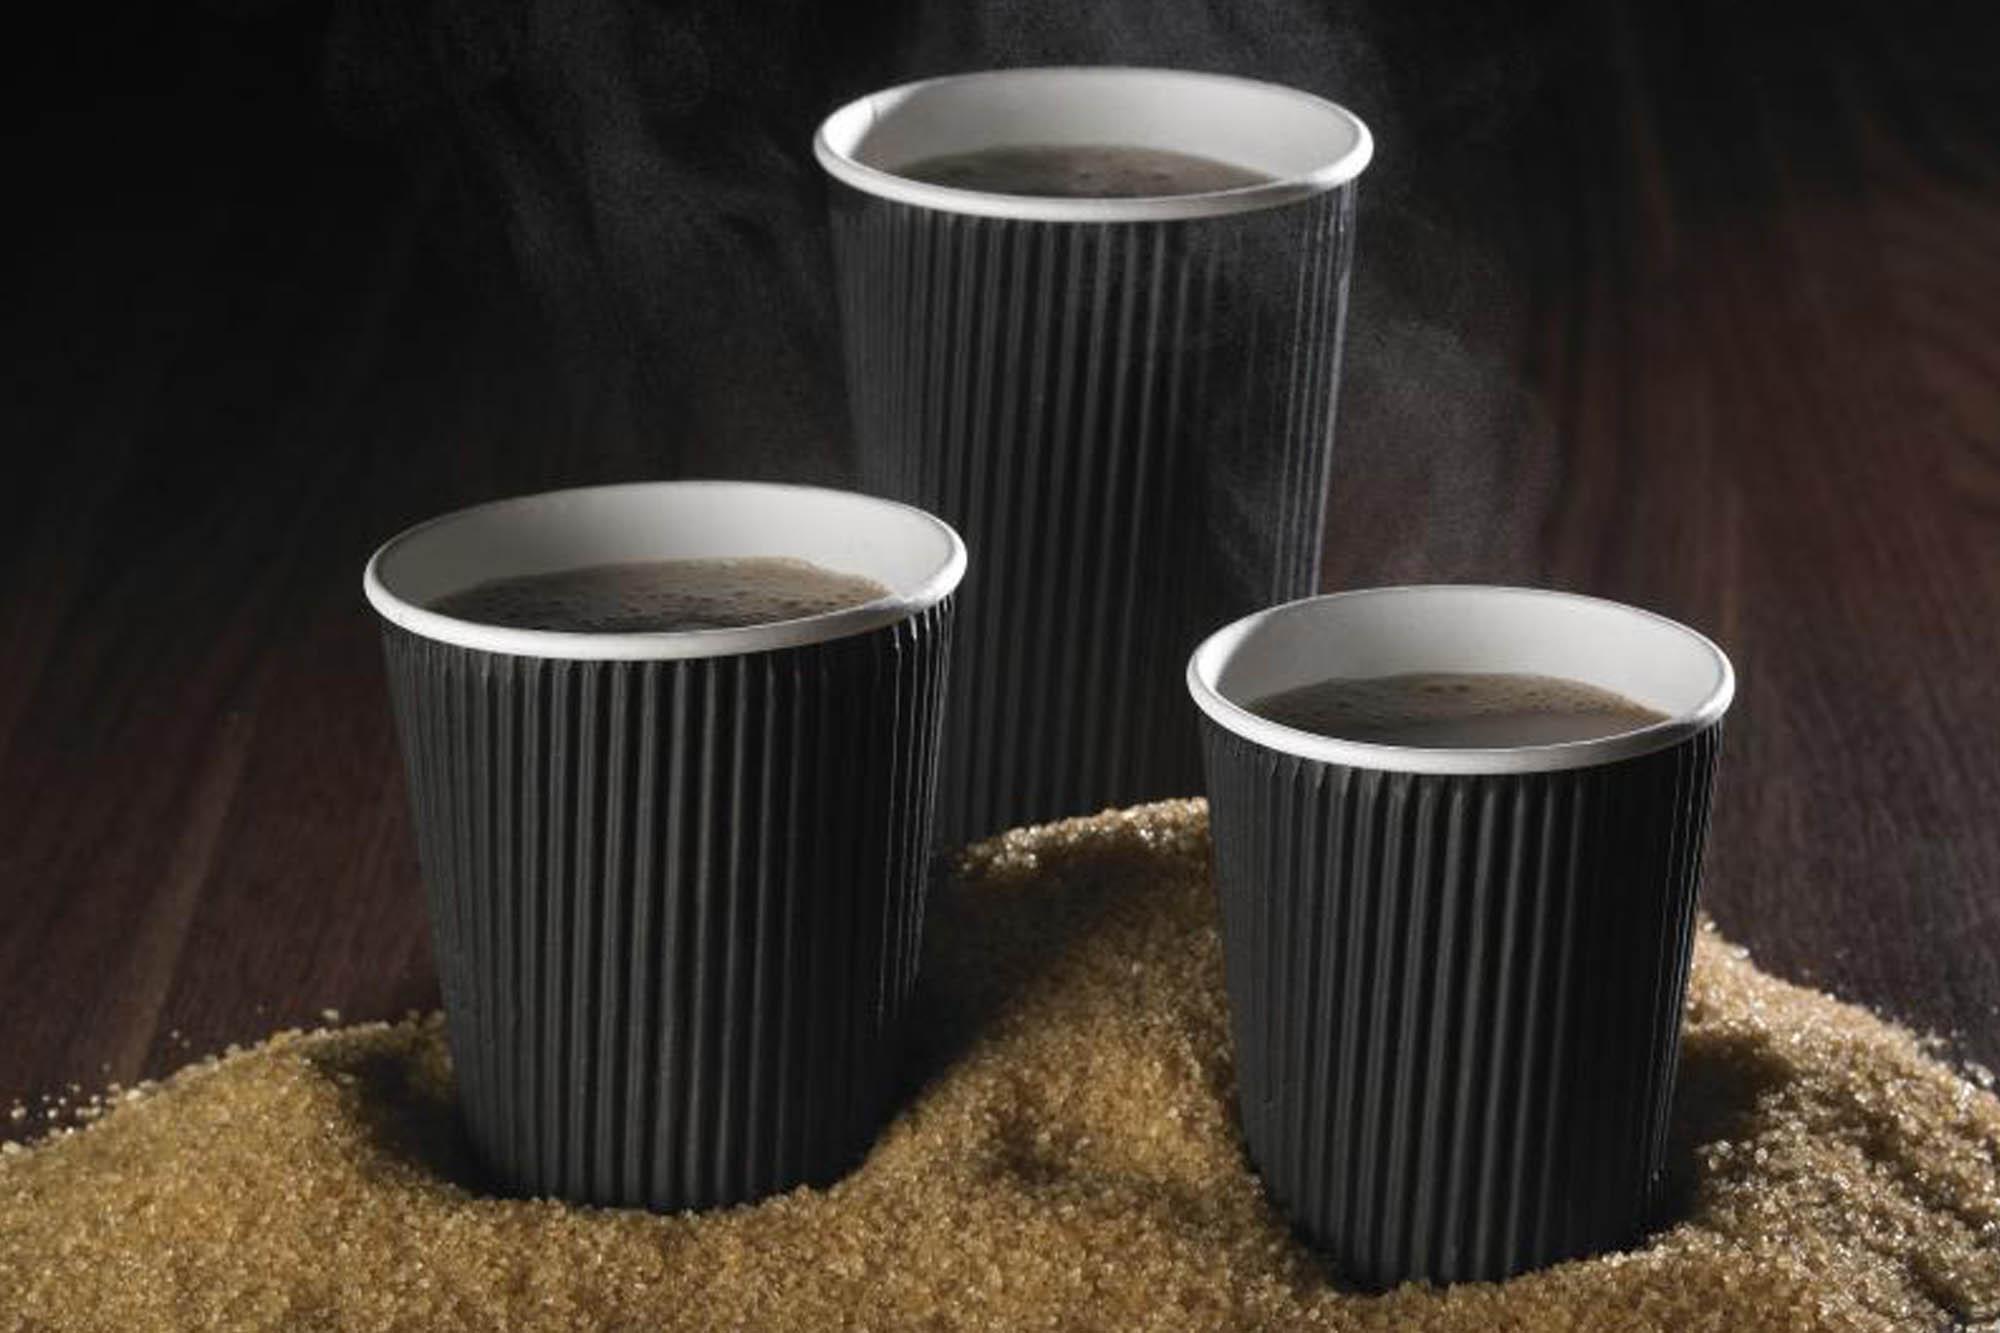 Black ripple cups